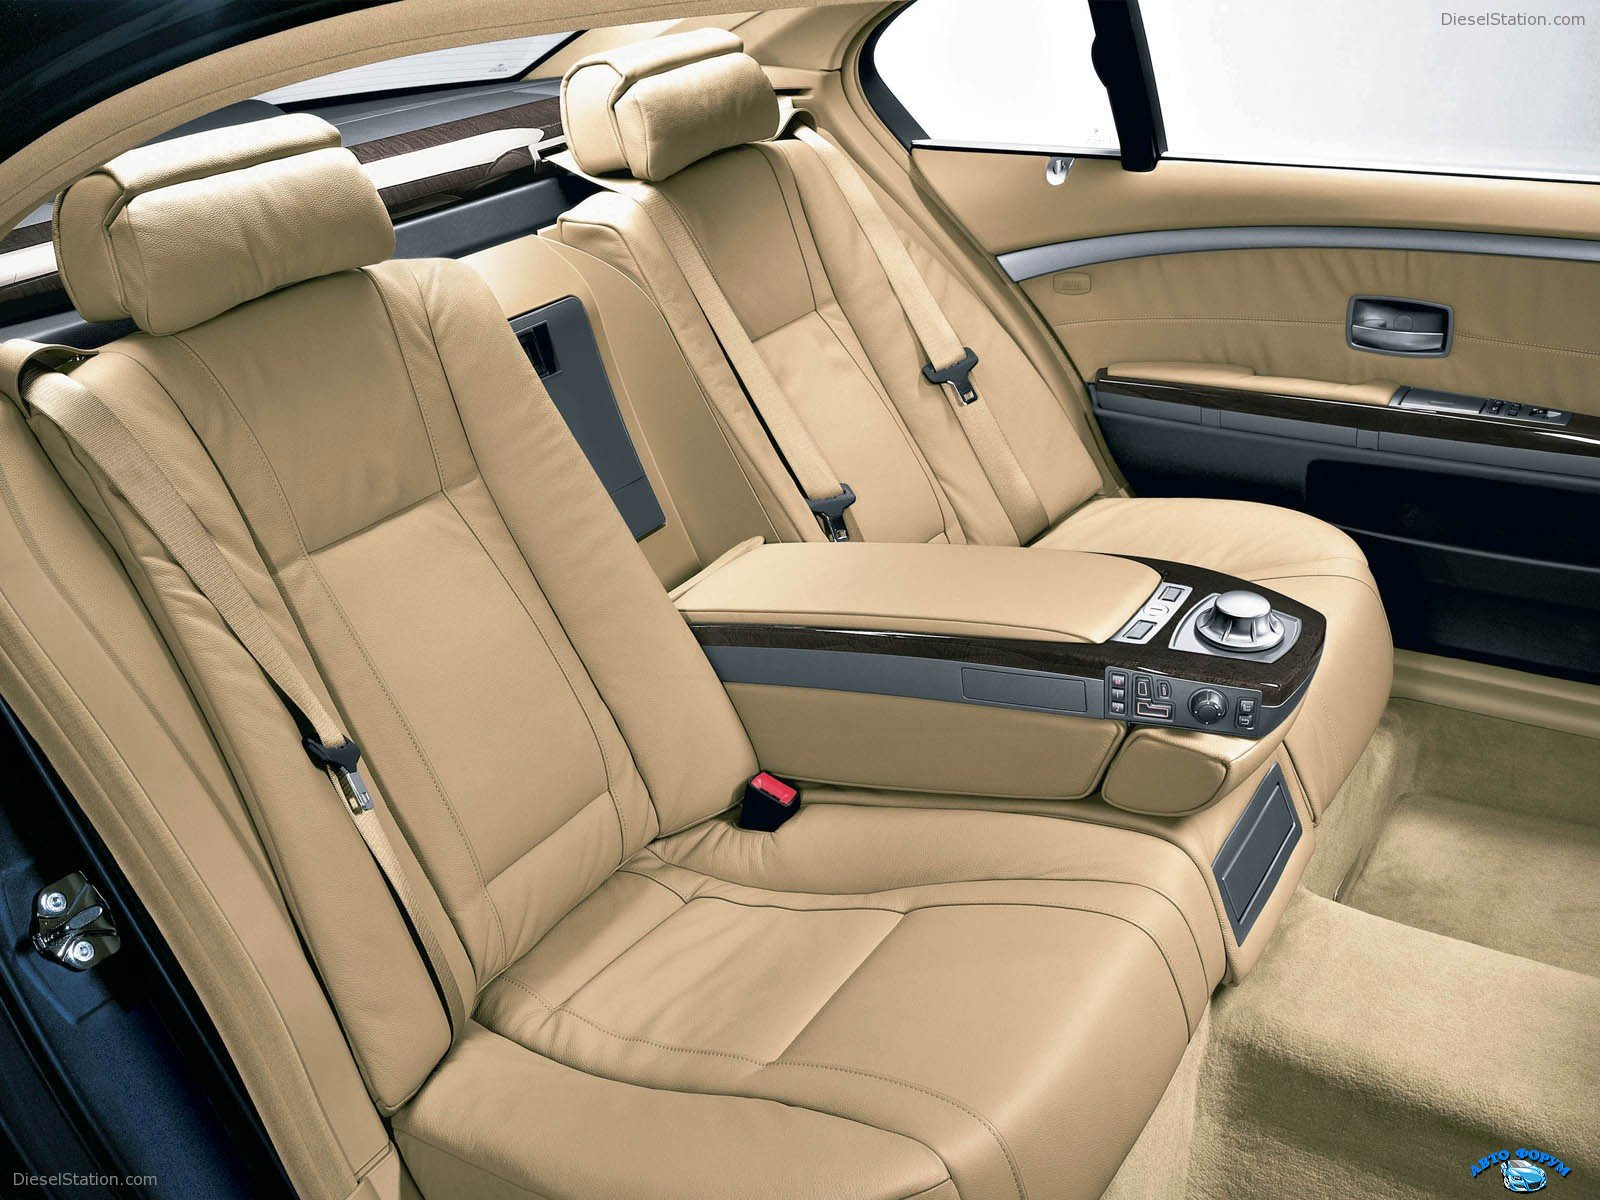 BMW-7Series-081.jpg